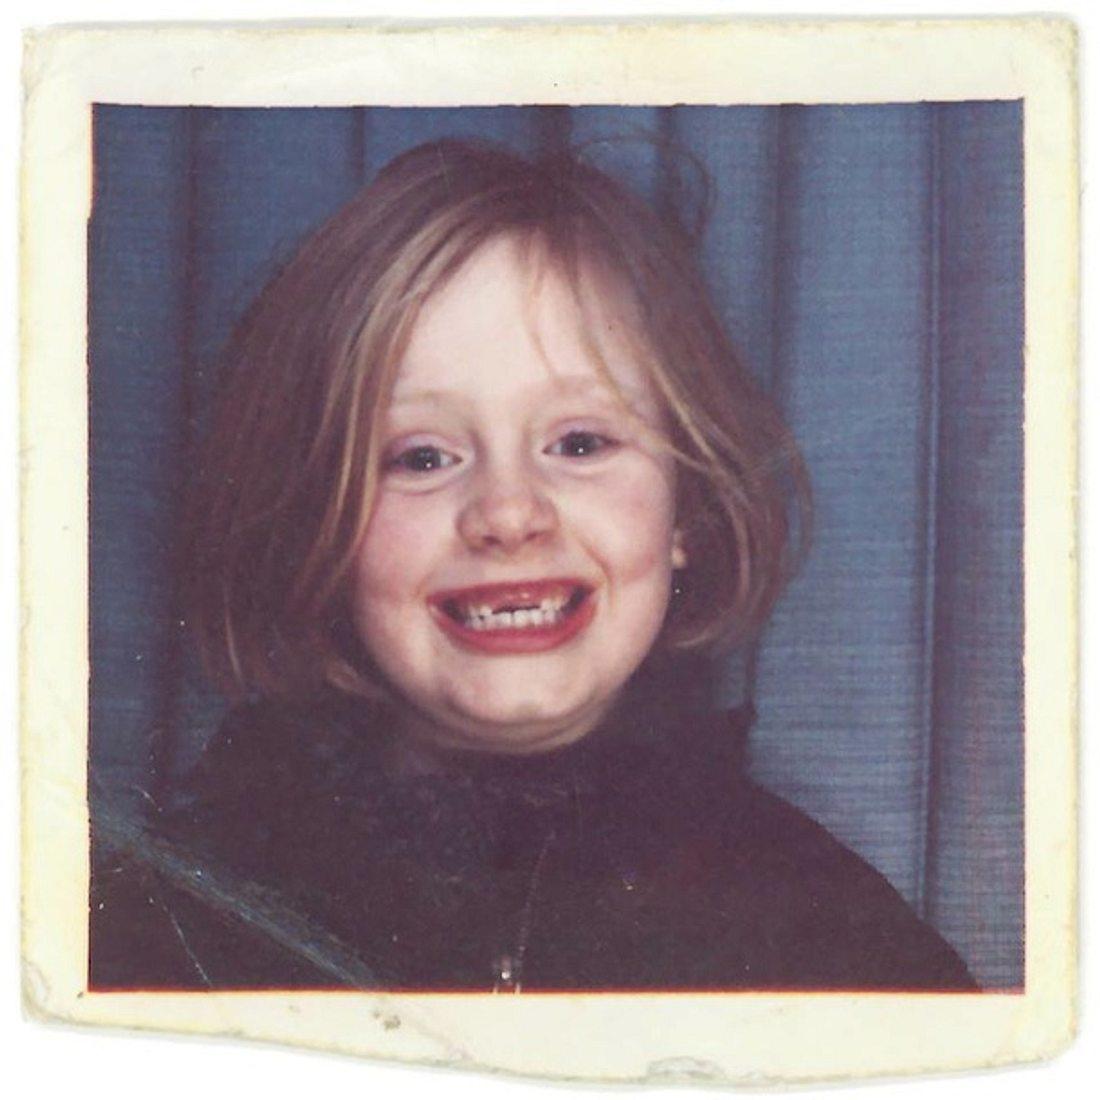 Süße Grinsebacke: So sah Adele als Kind aus